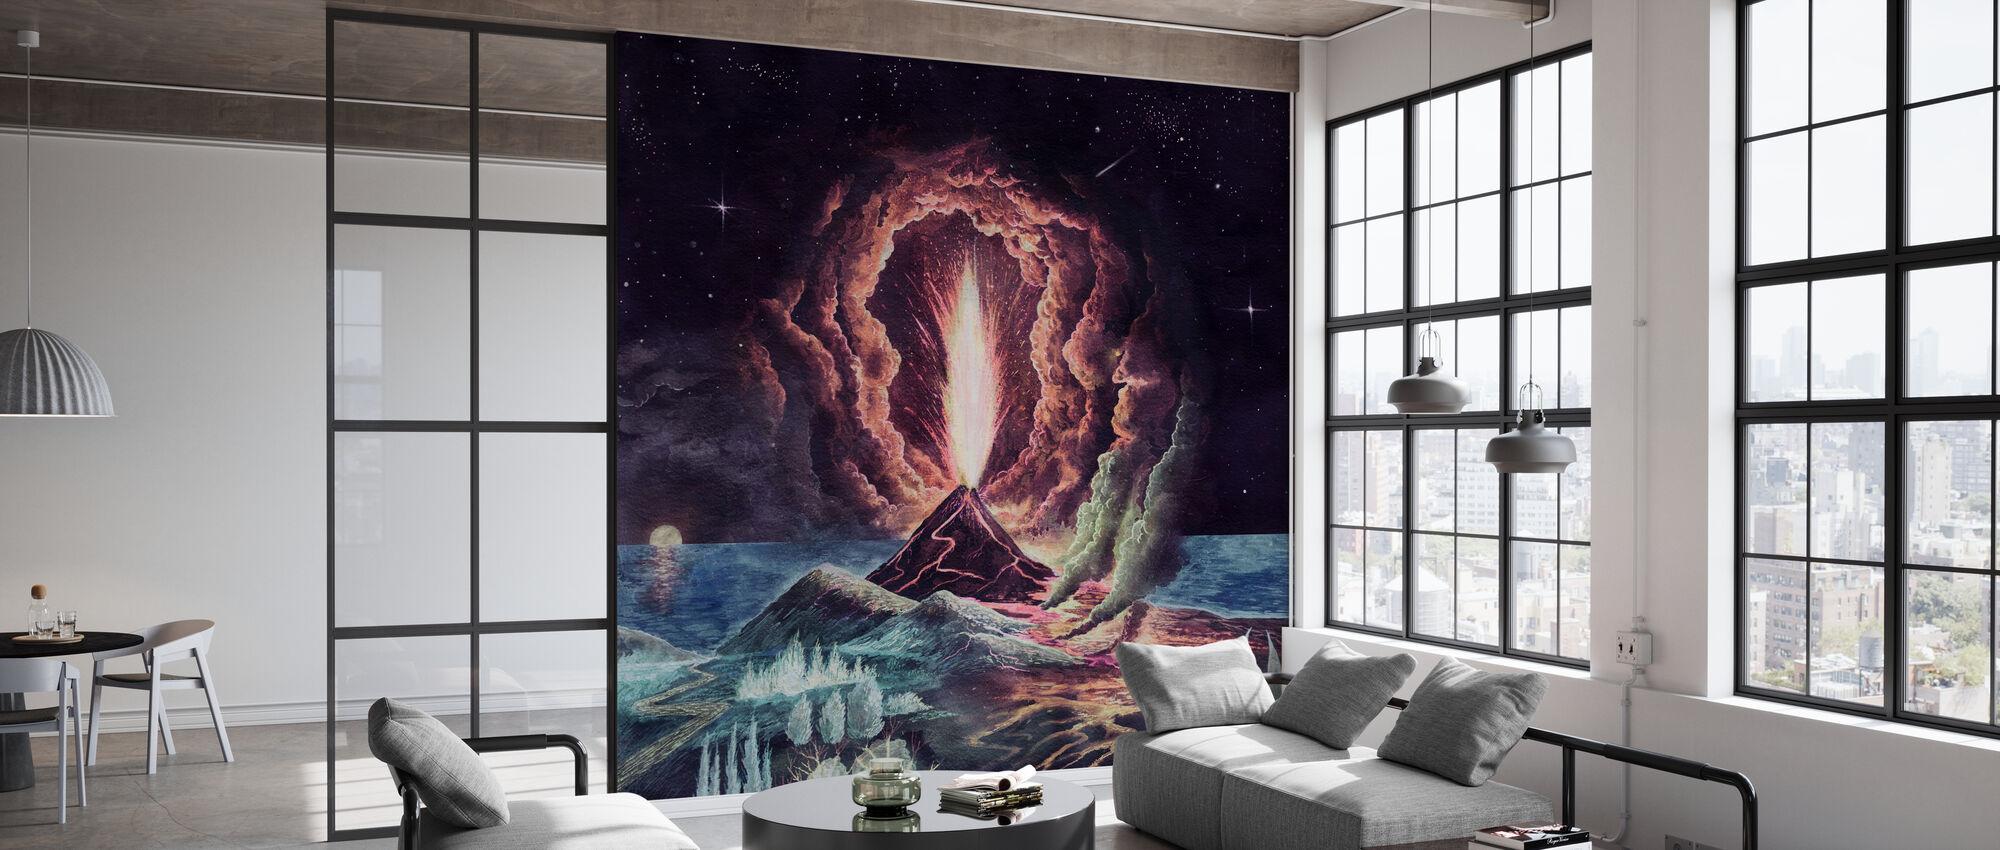 Volcano Eruption - Wallpaper - Office